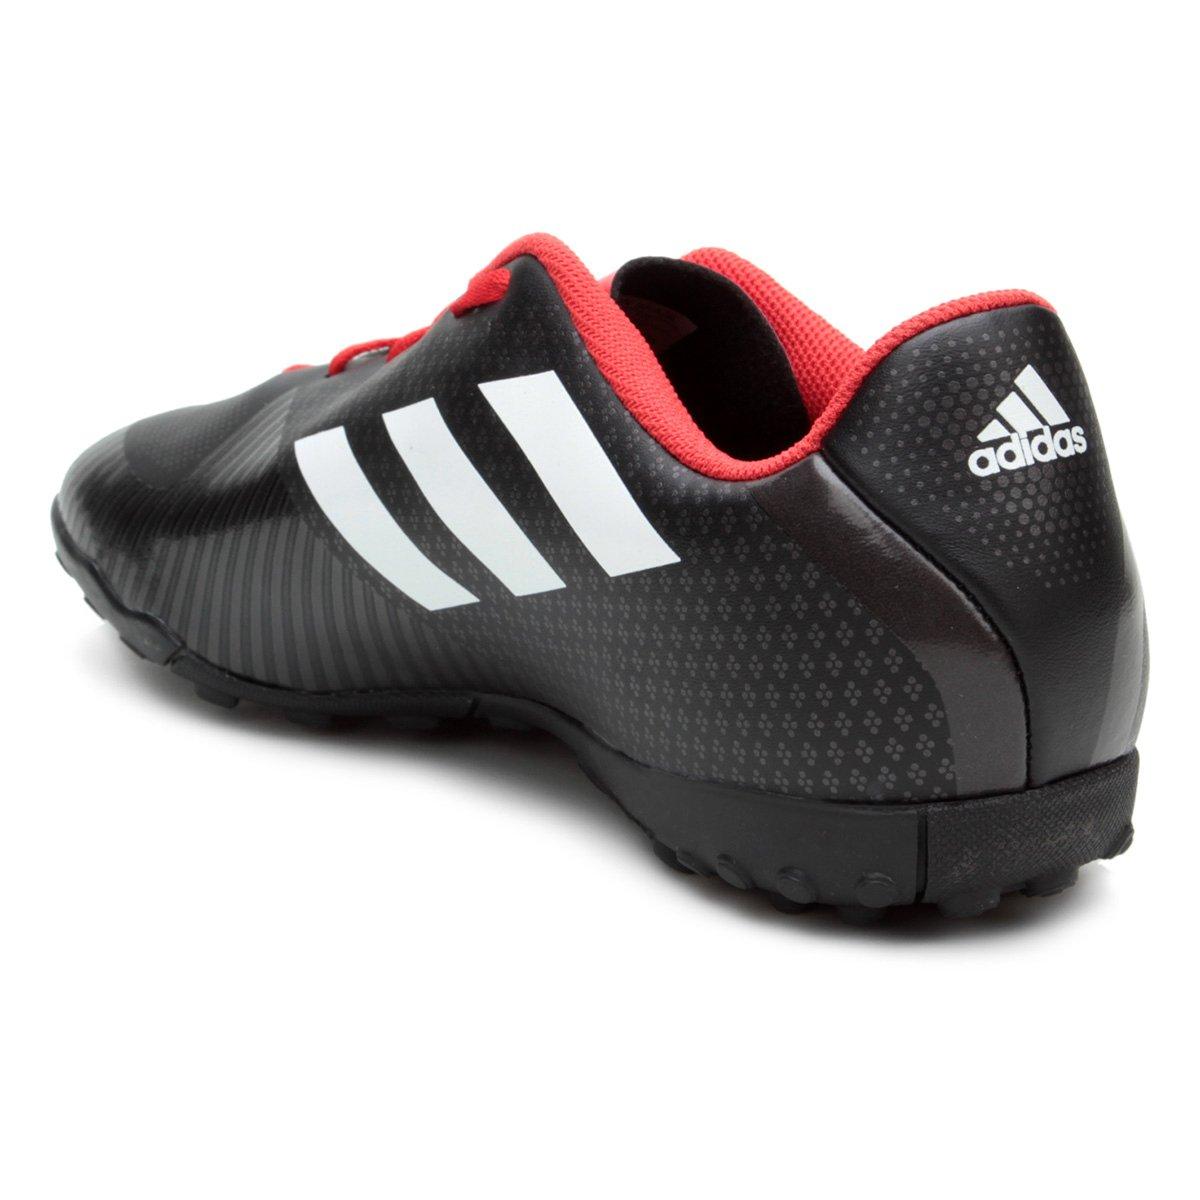 ... Chuteira Society Adidas Artilheira III TF Masculina - Preta e Vermelha  ... 42d647bb3673d